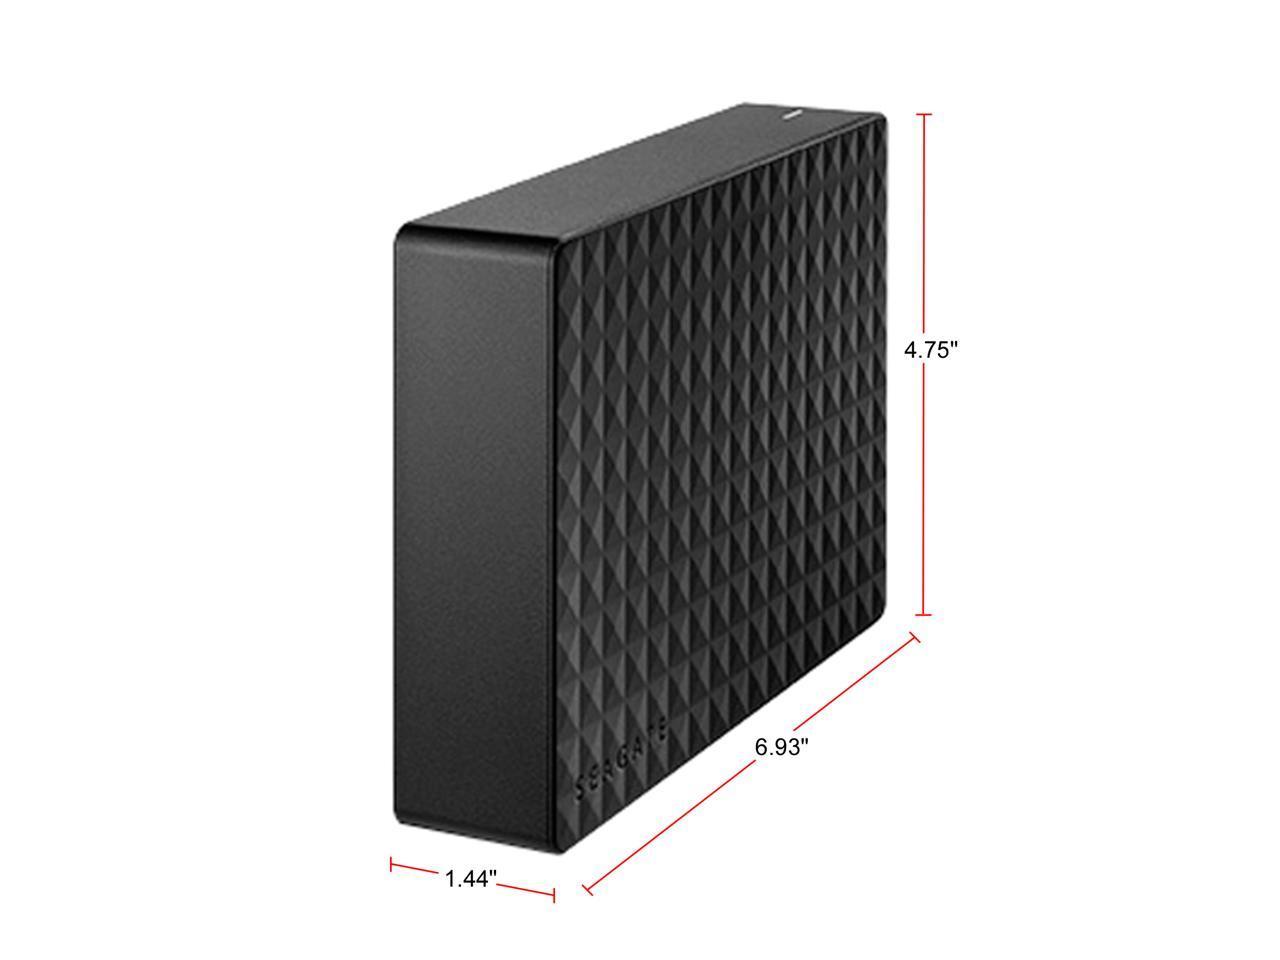 12TB Seagate Expansion Desktop Hard Drive $260